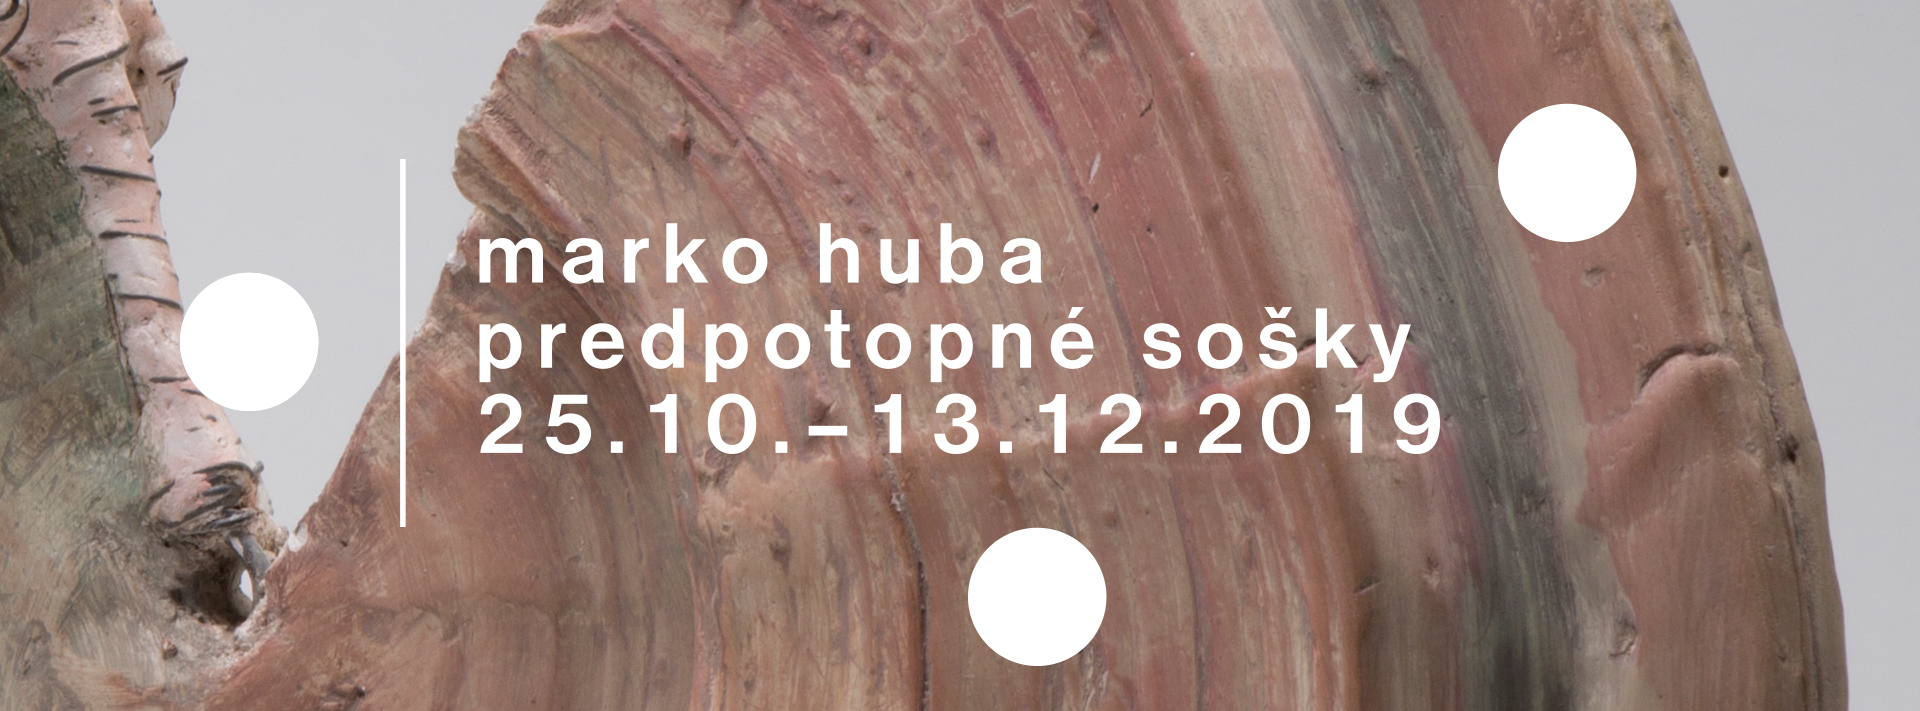 Marko Huba – Predpotopné sošky